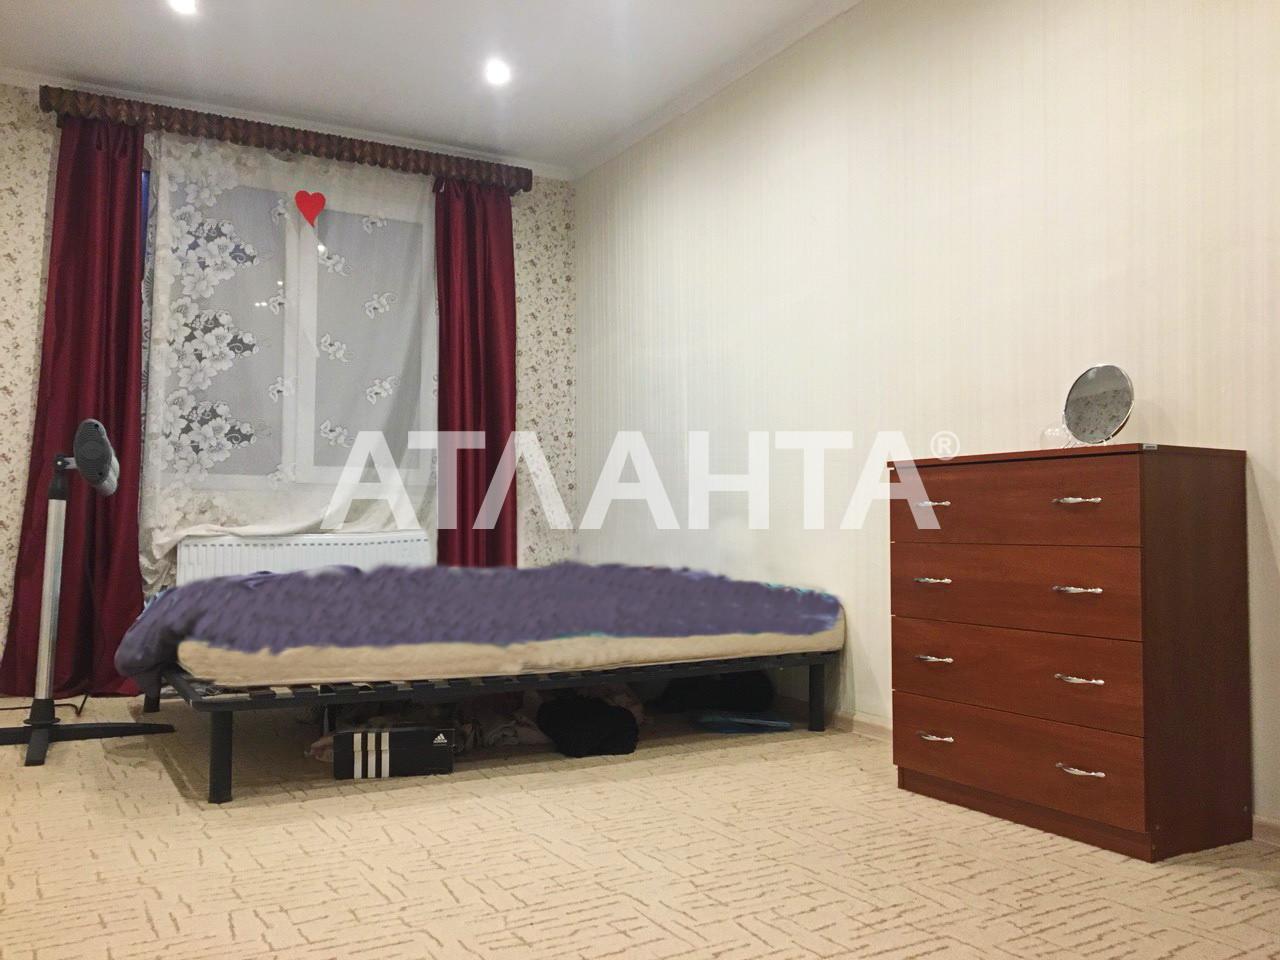 Сдается 1-комнатная Квартира на ул. Мясоедовская (Шолом Алейхема) — 259 у.е./мес.